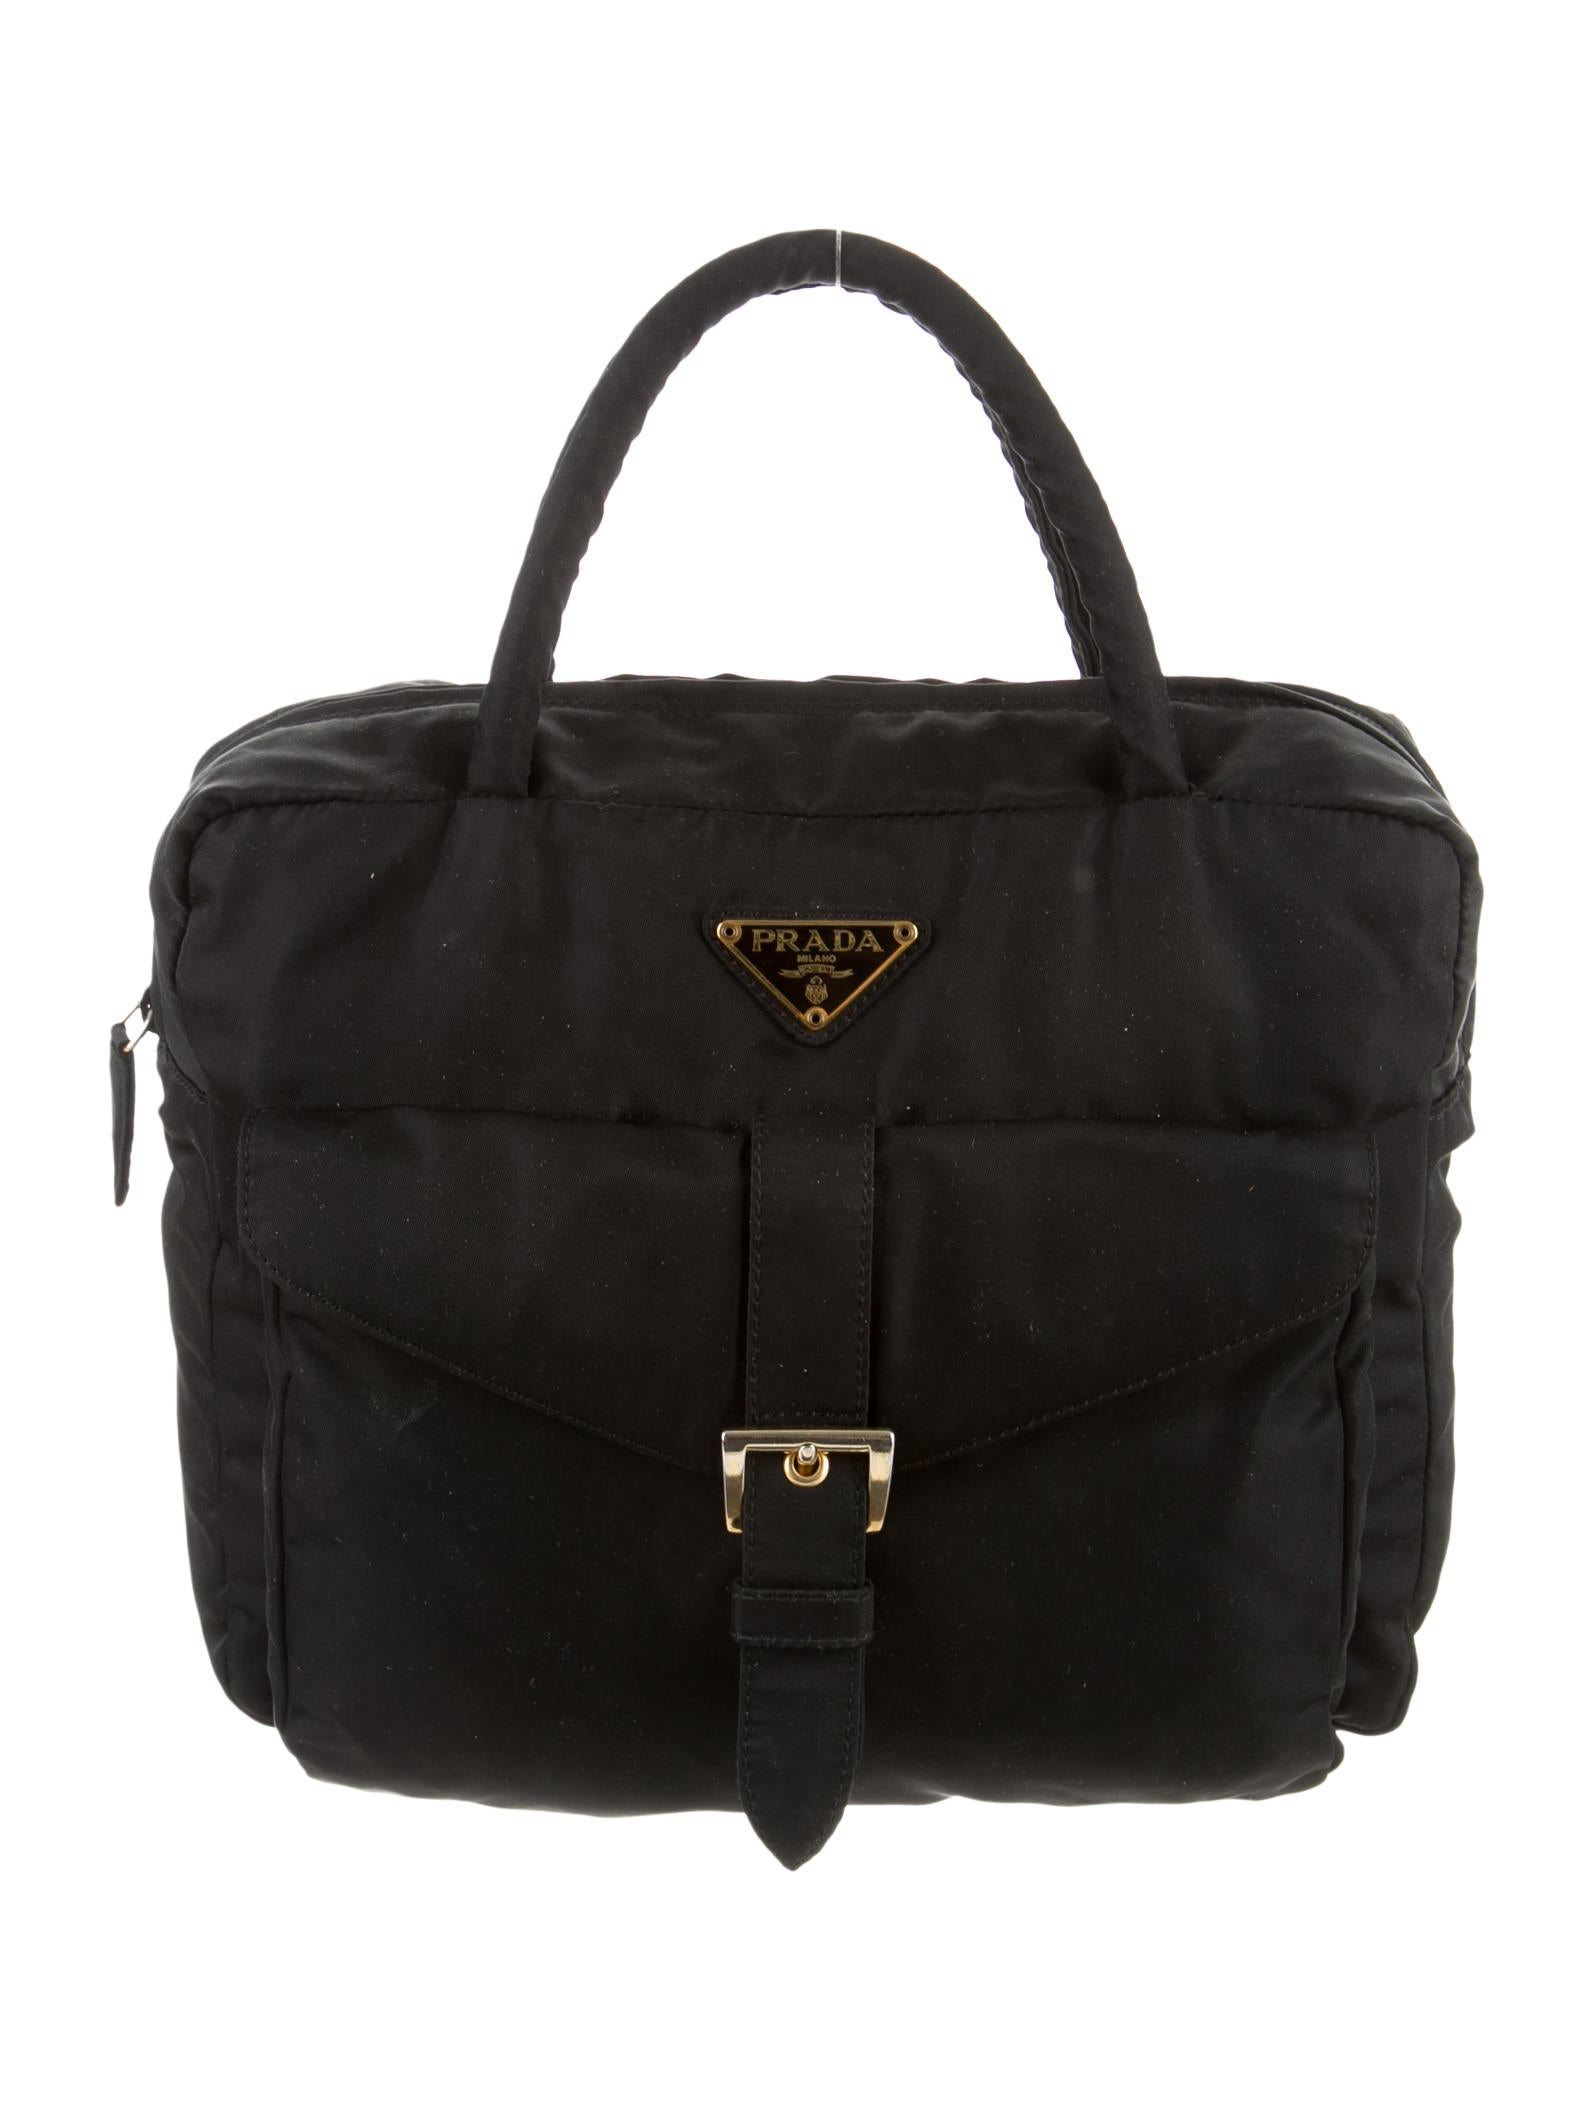 Prada Tessuto Handle Bag - Handbags - PRA83636 | The RealReal